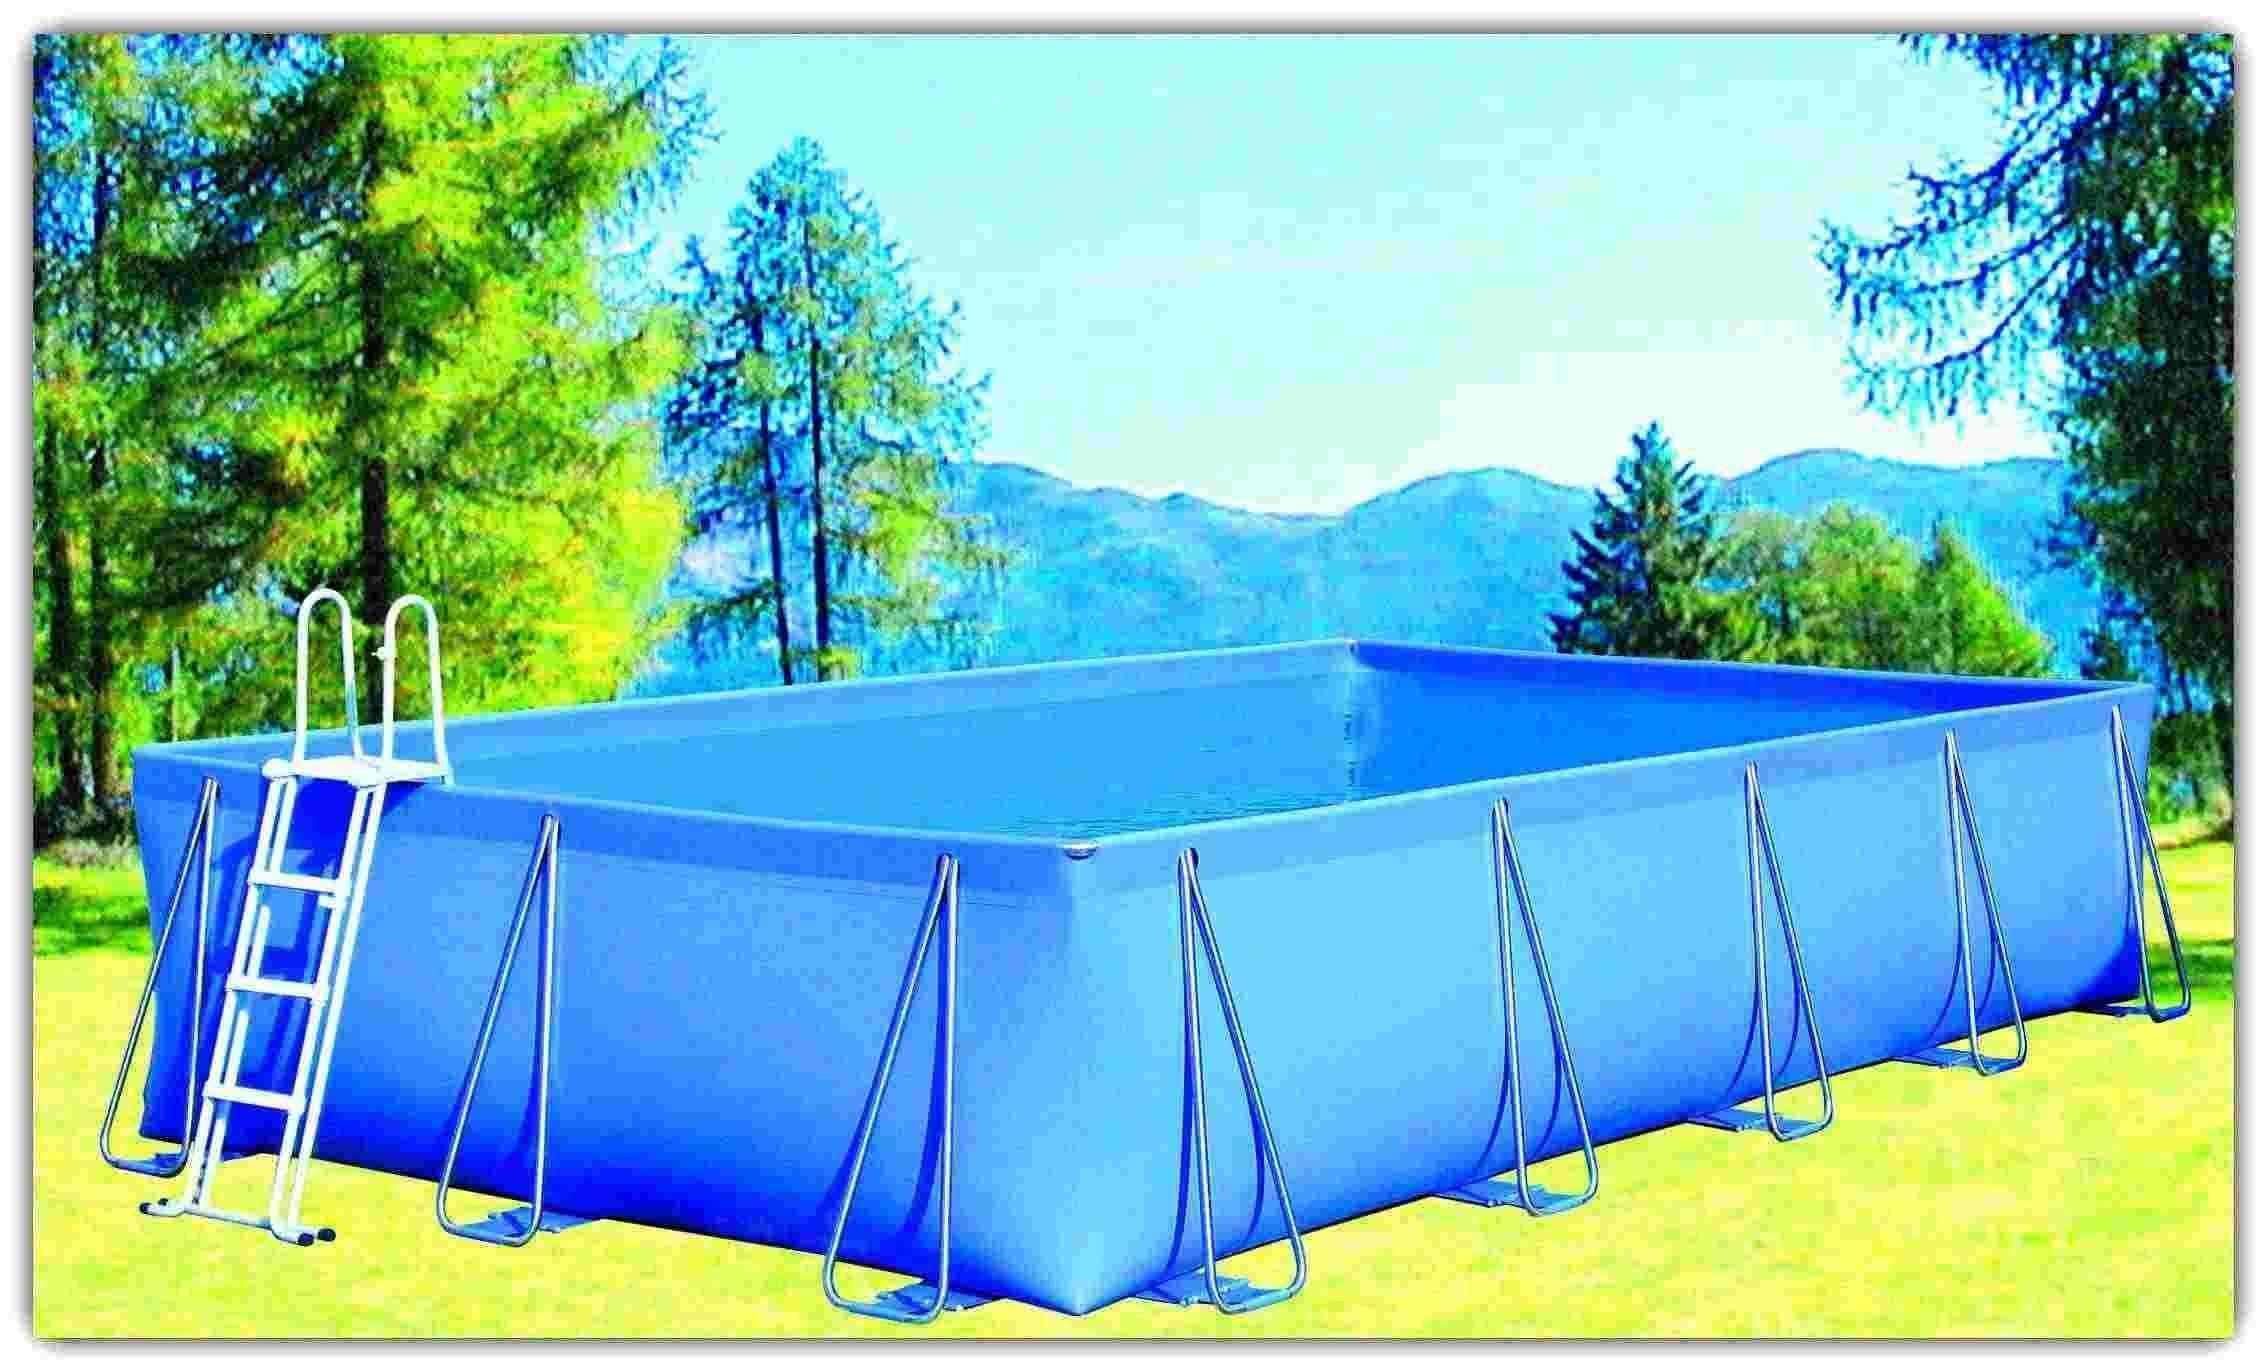 Above ground swimming pools, Buy from De Lorenzis New Line ...